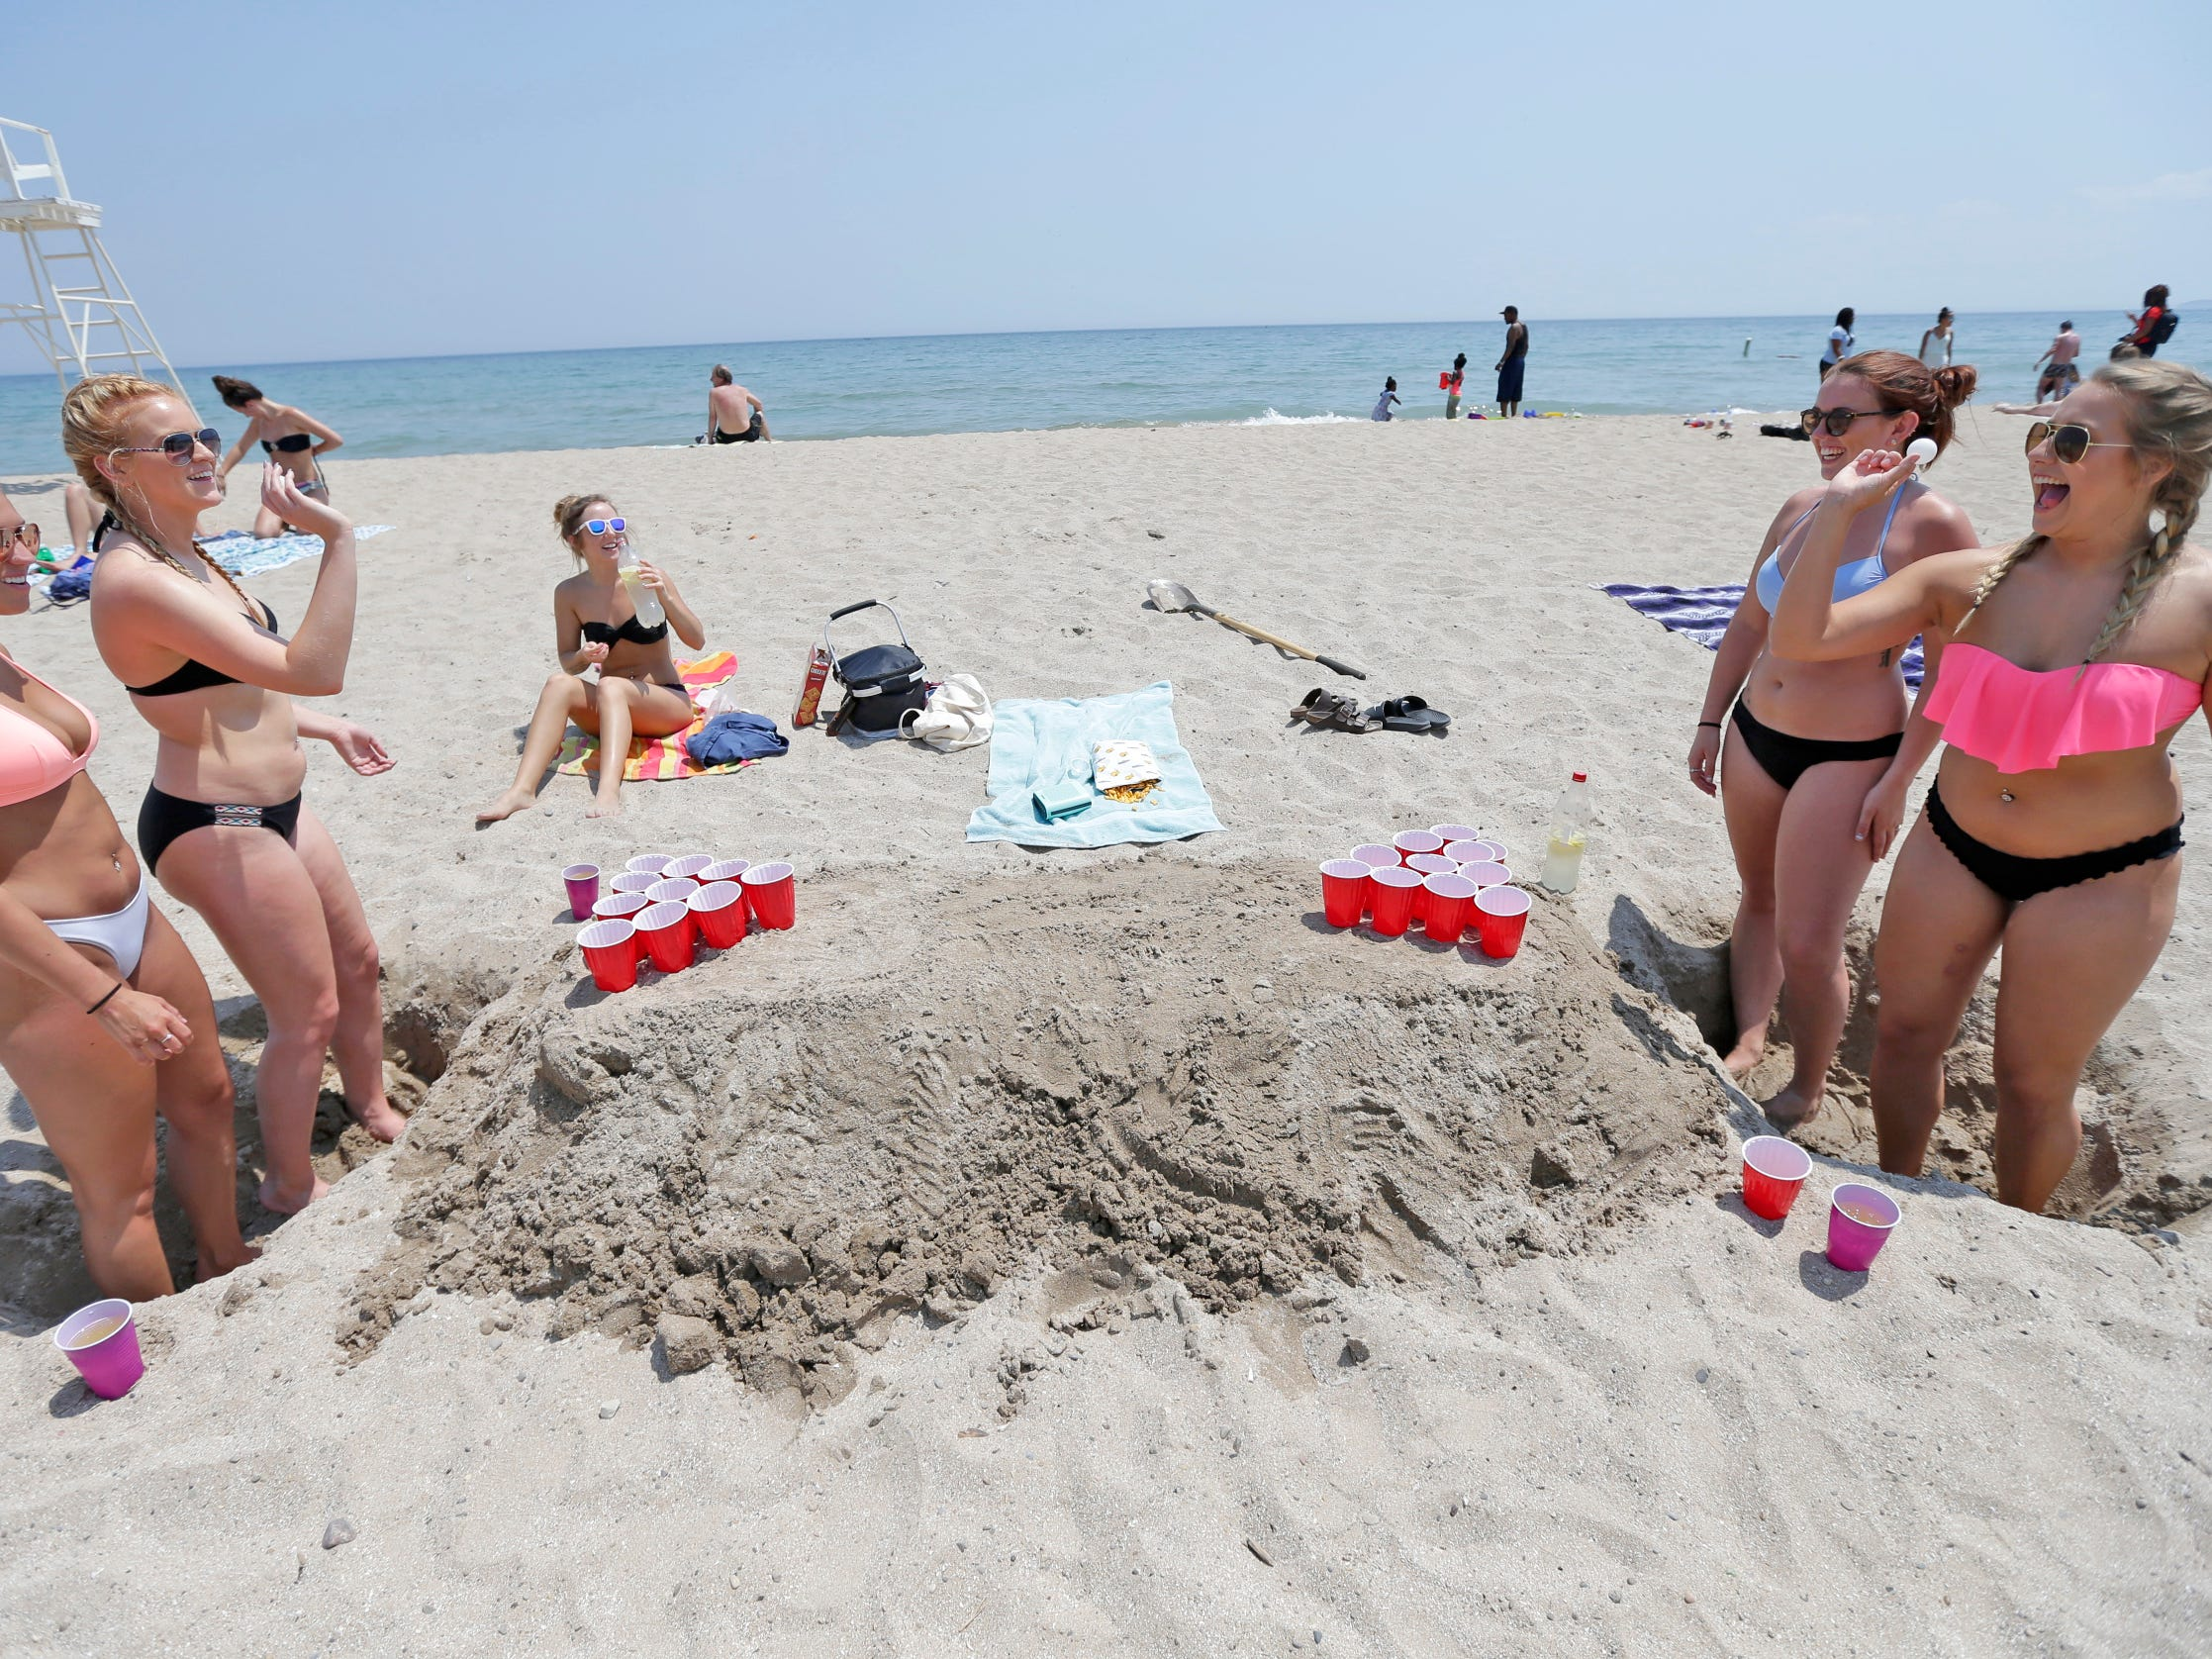 Kayla Swanson (from left), 19, of Kenosha, Kayla Hinze, 19, of Racine, Naomi Campbell, 20, of Cedarburg, and Caitlyn Slaasted, 20, of Union Grove play a game on Bradford Beach.